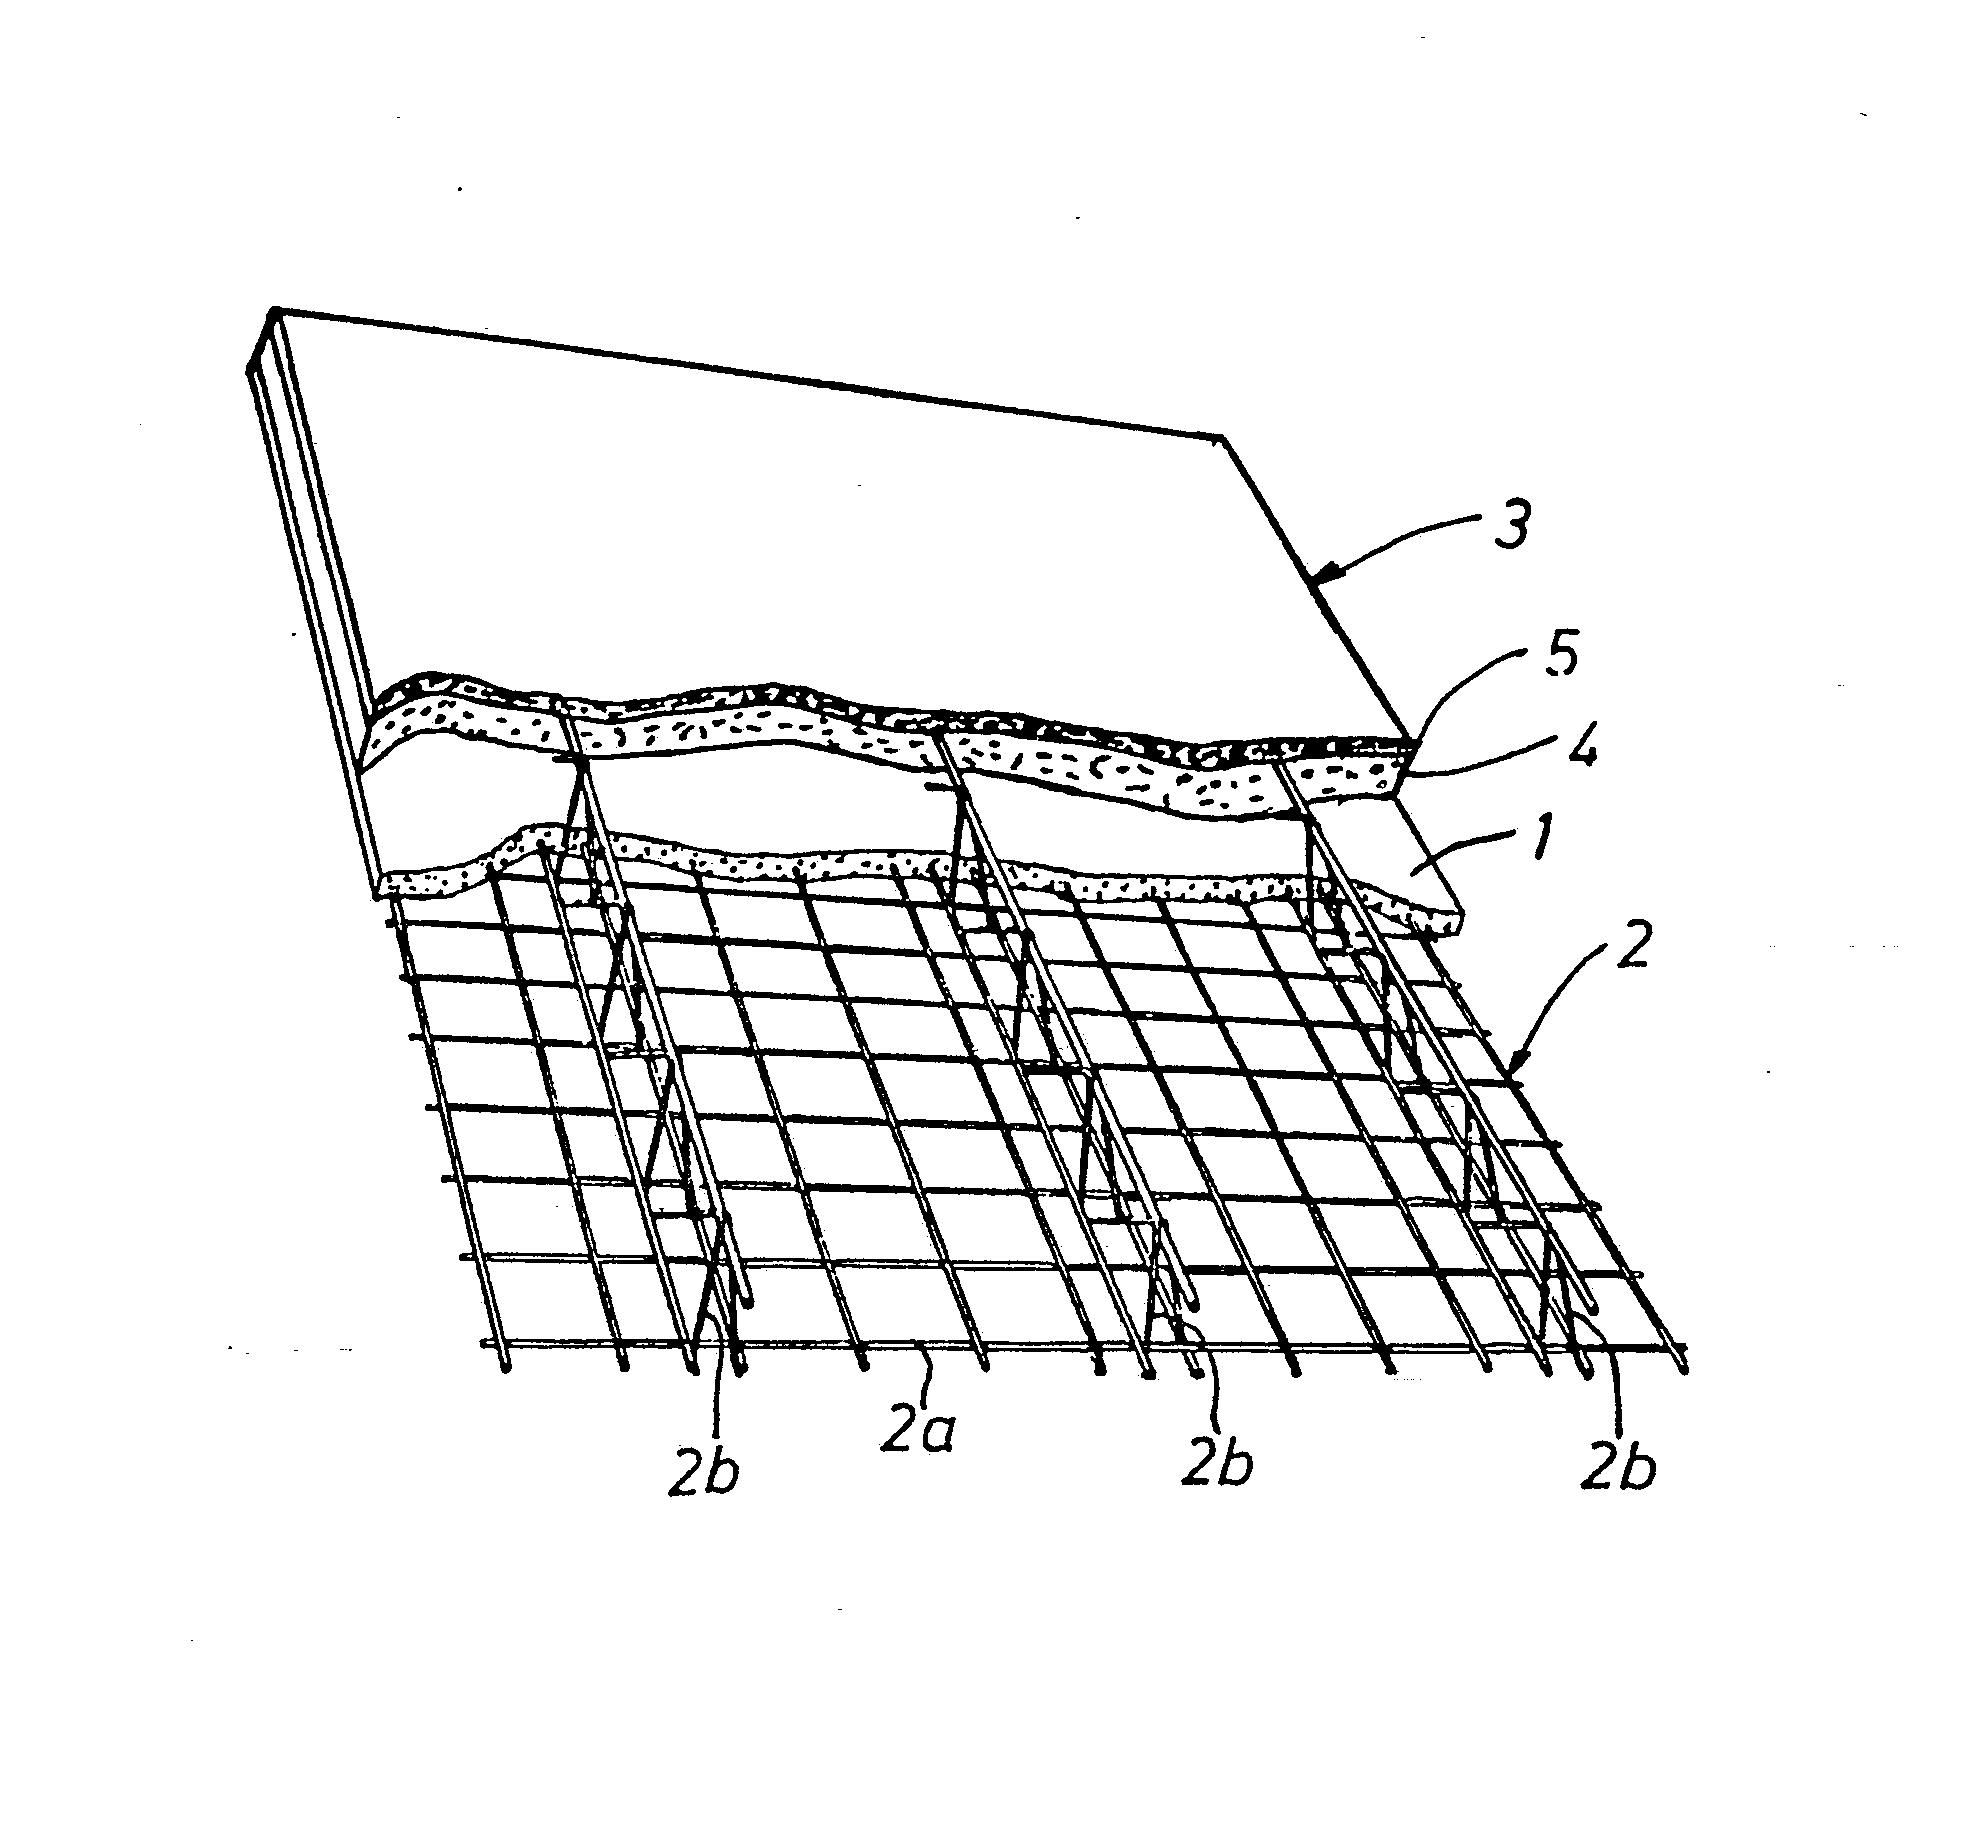 Concrete Slab Drawings : Patent ep a concrete element for structural floor